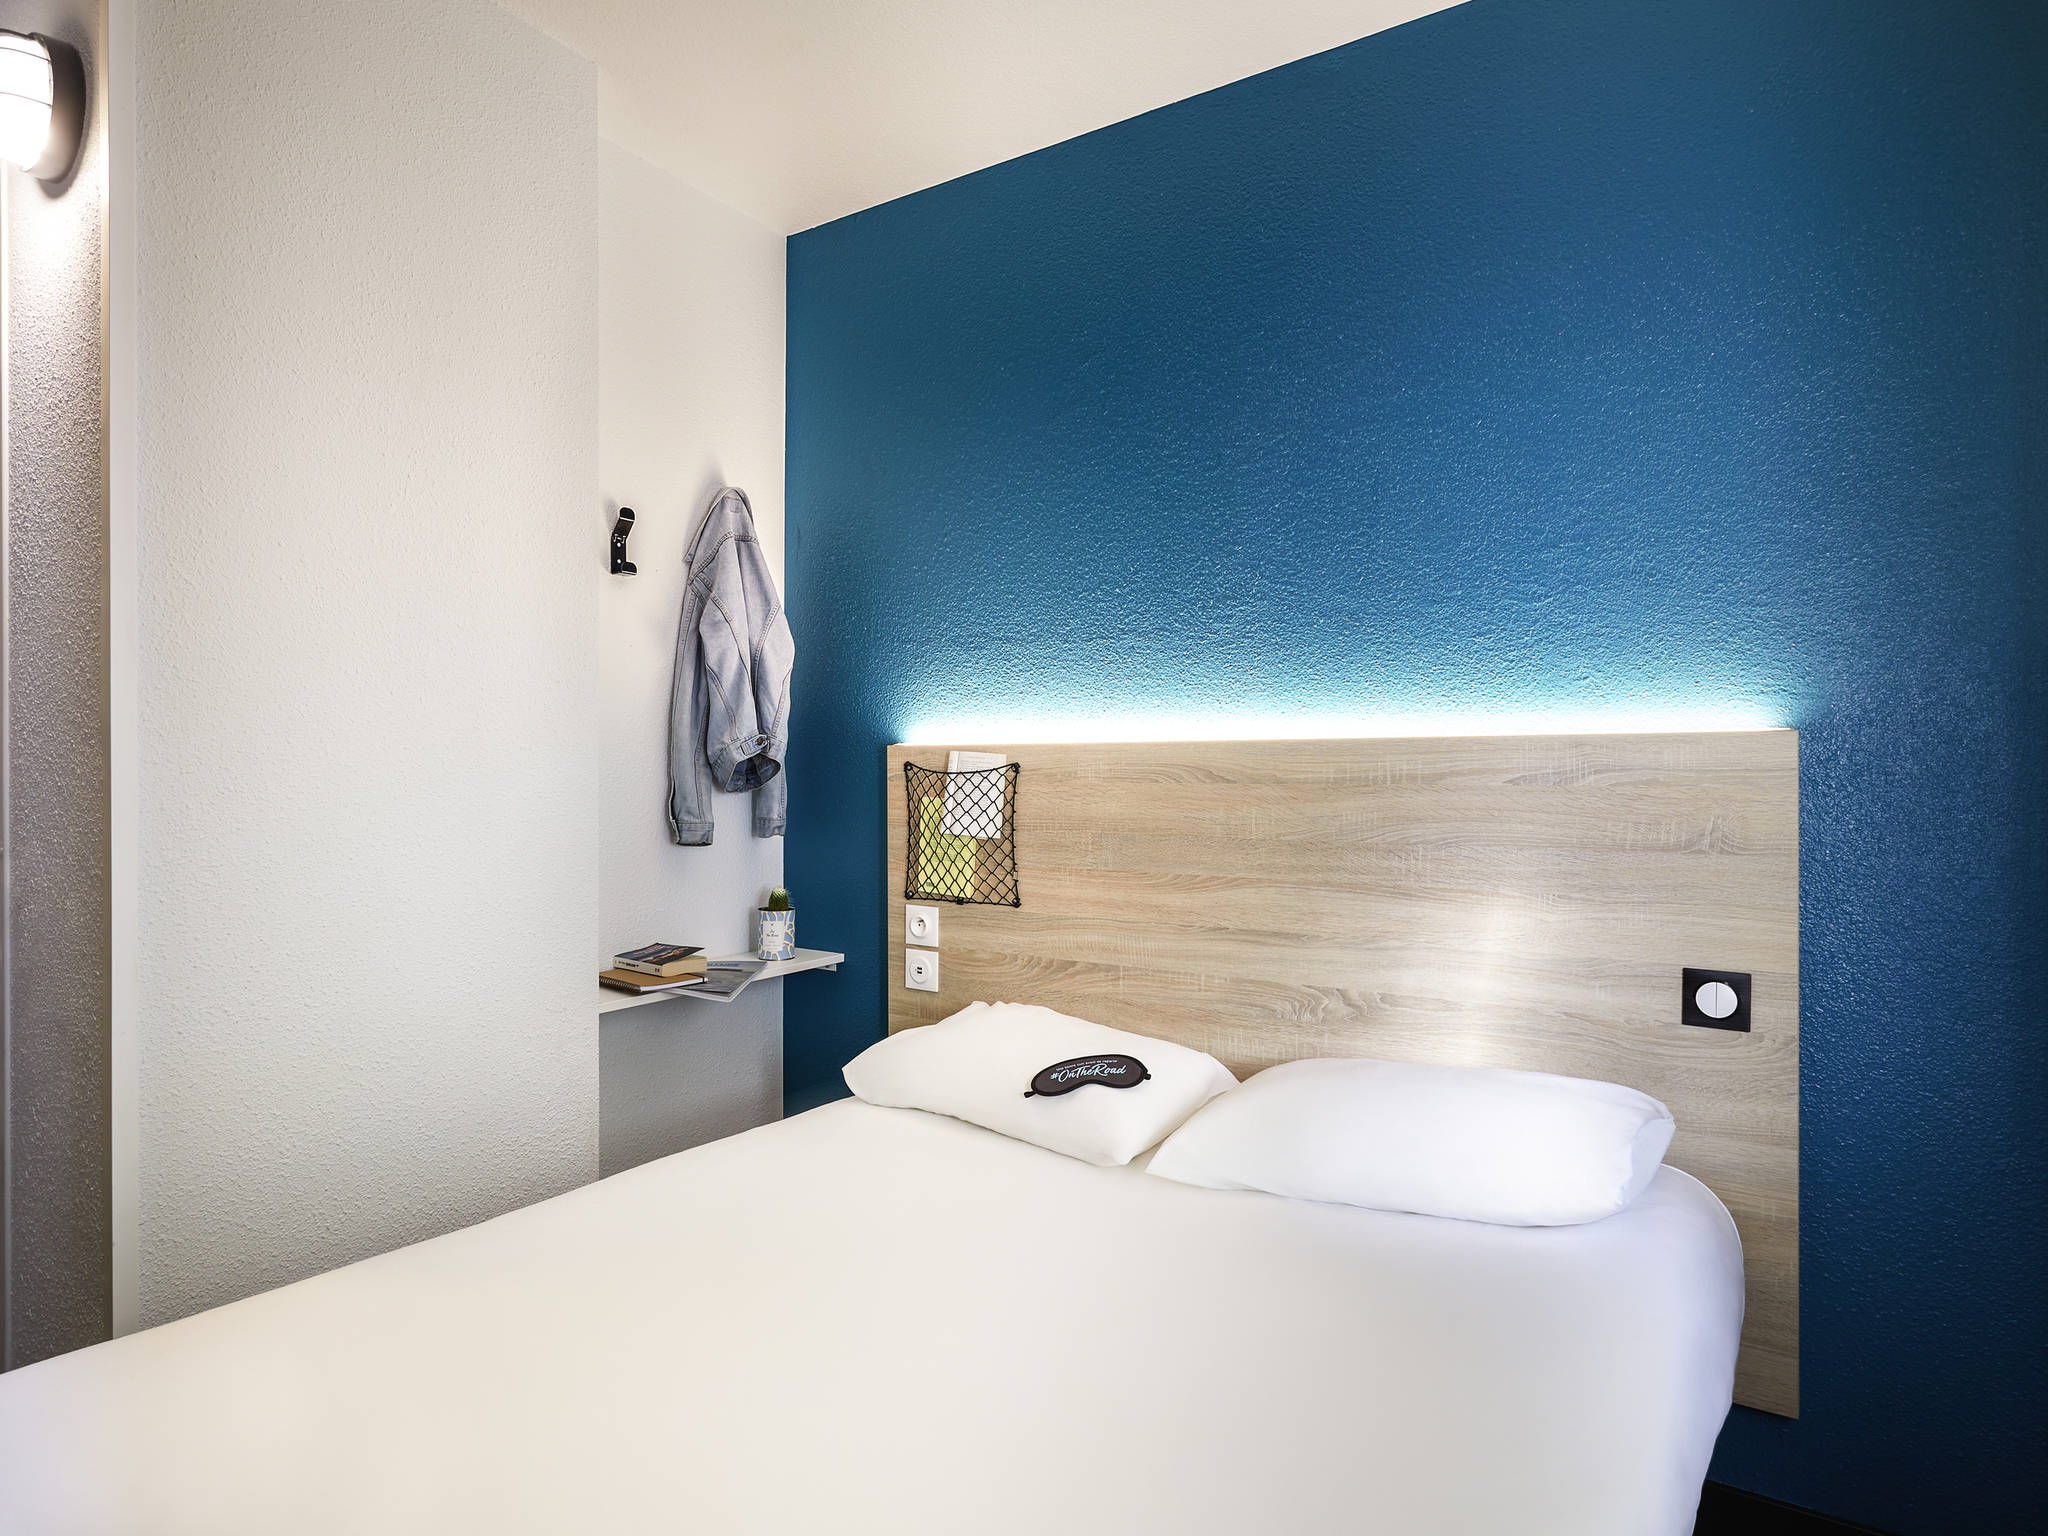 فندق - hotelF1 Nîmes Ouest